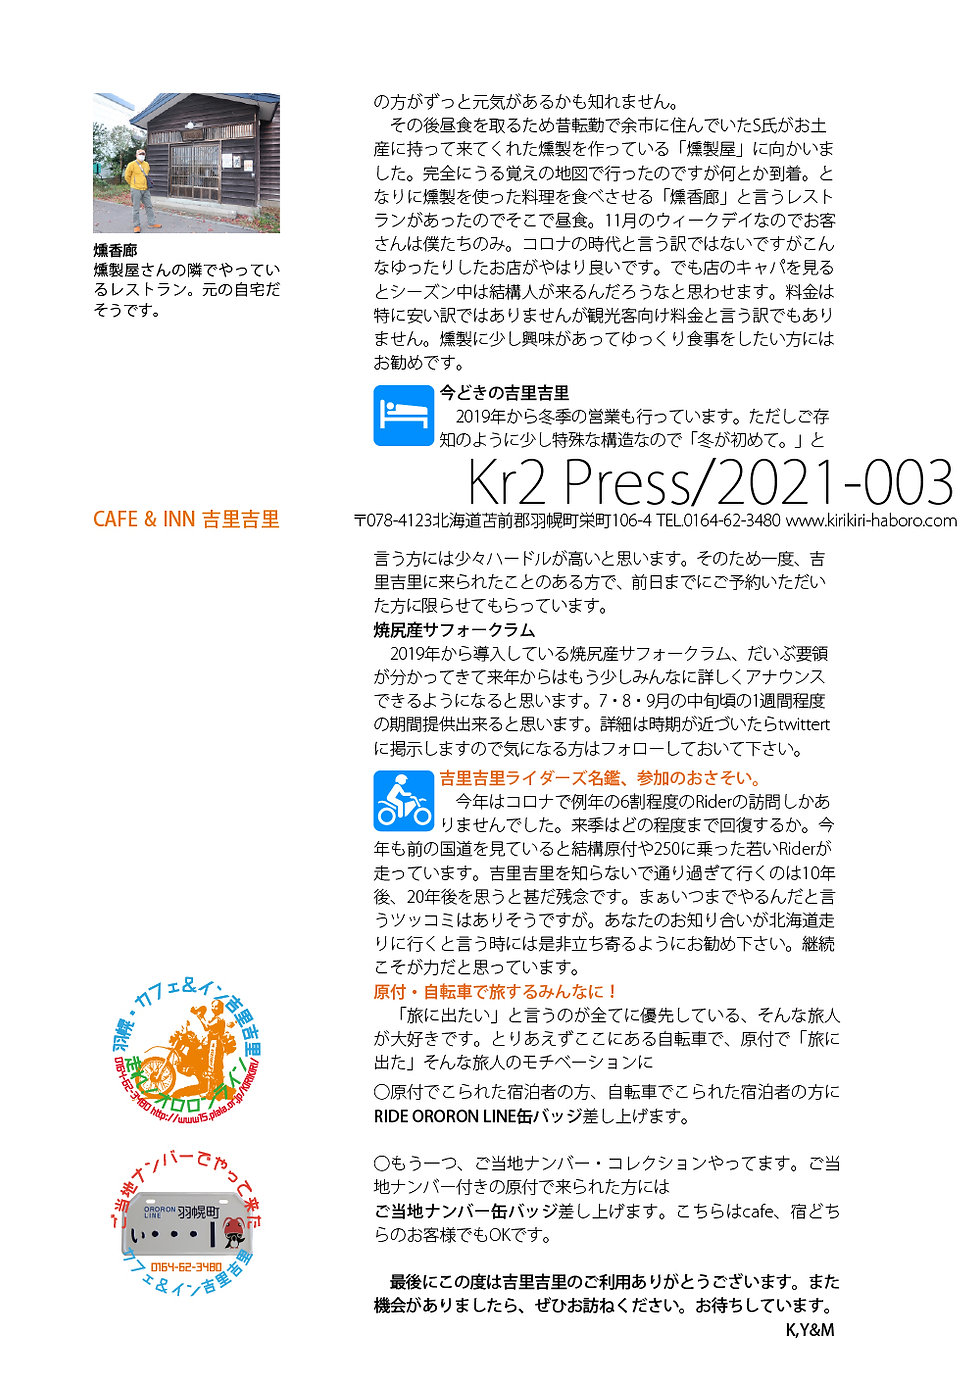 2021Kr2Press003.jpg